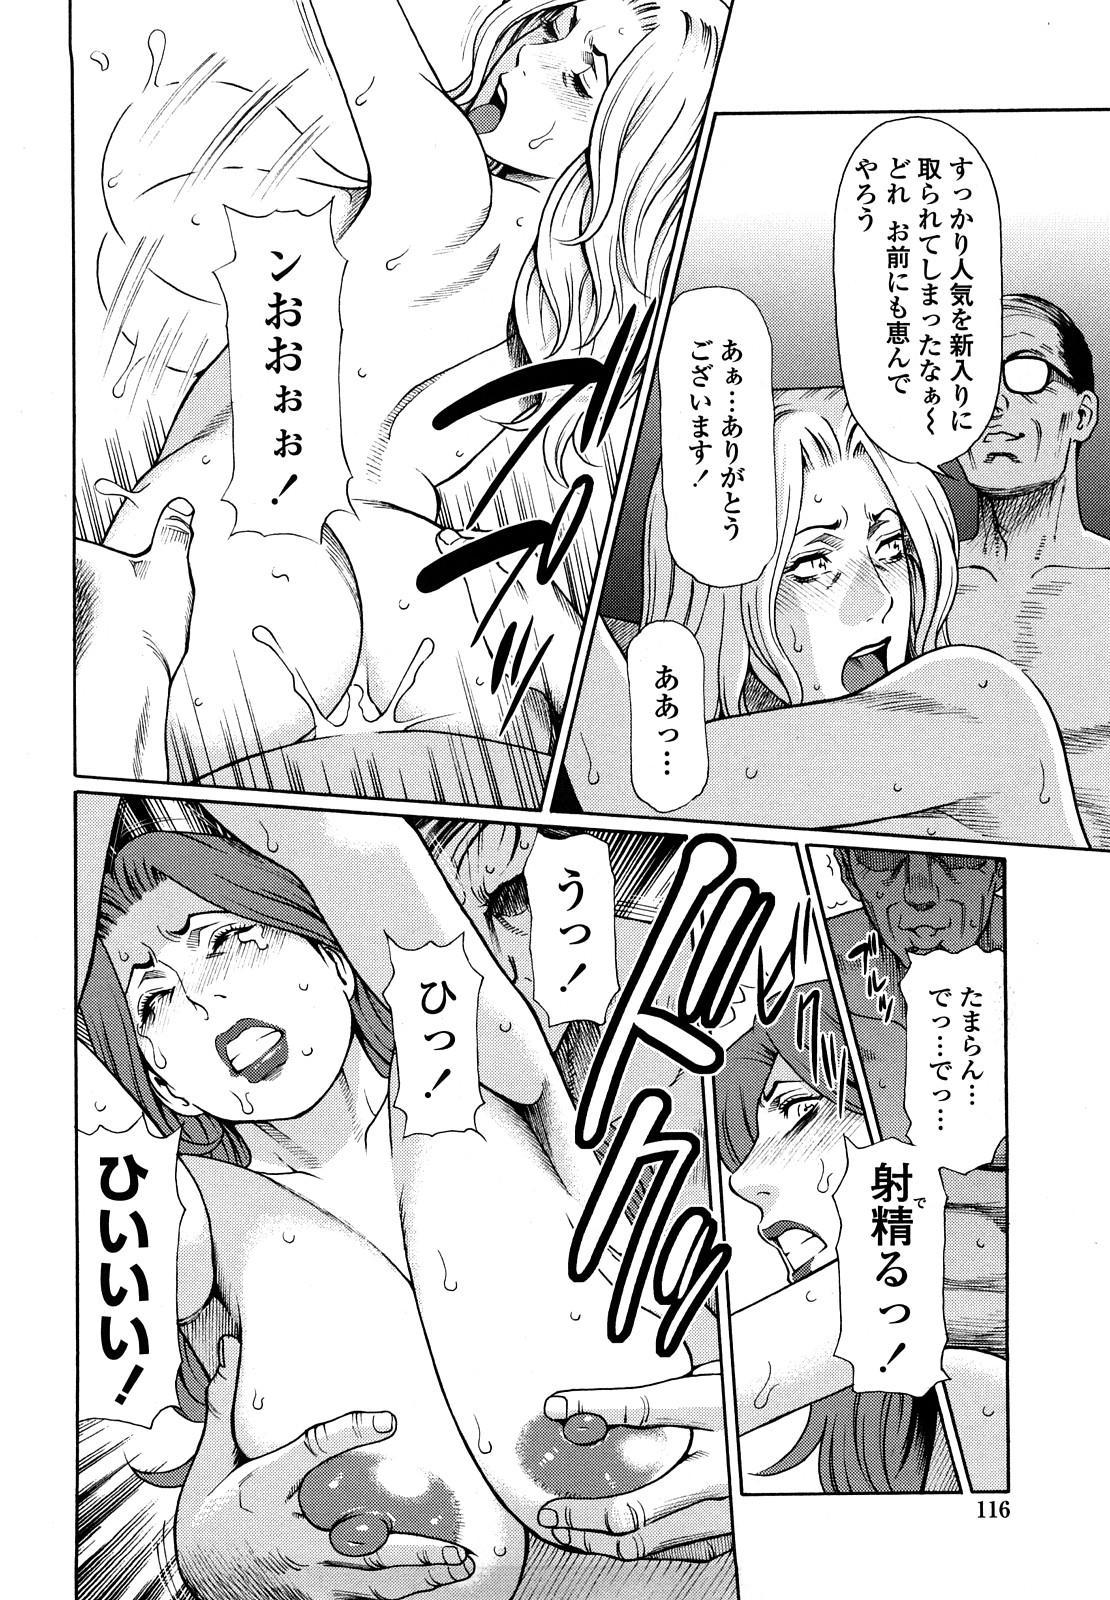 [Takasugi Kou] Kindan no Haha-Ana - Immorality Love-Hole [Decensored] 117